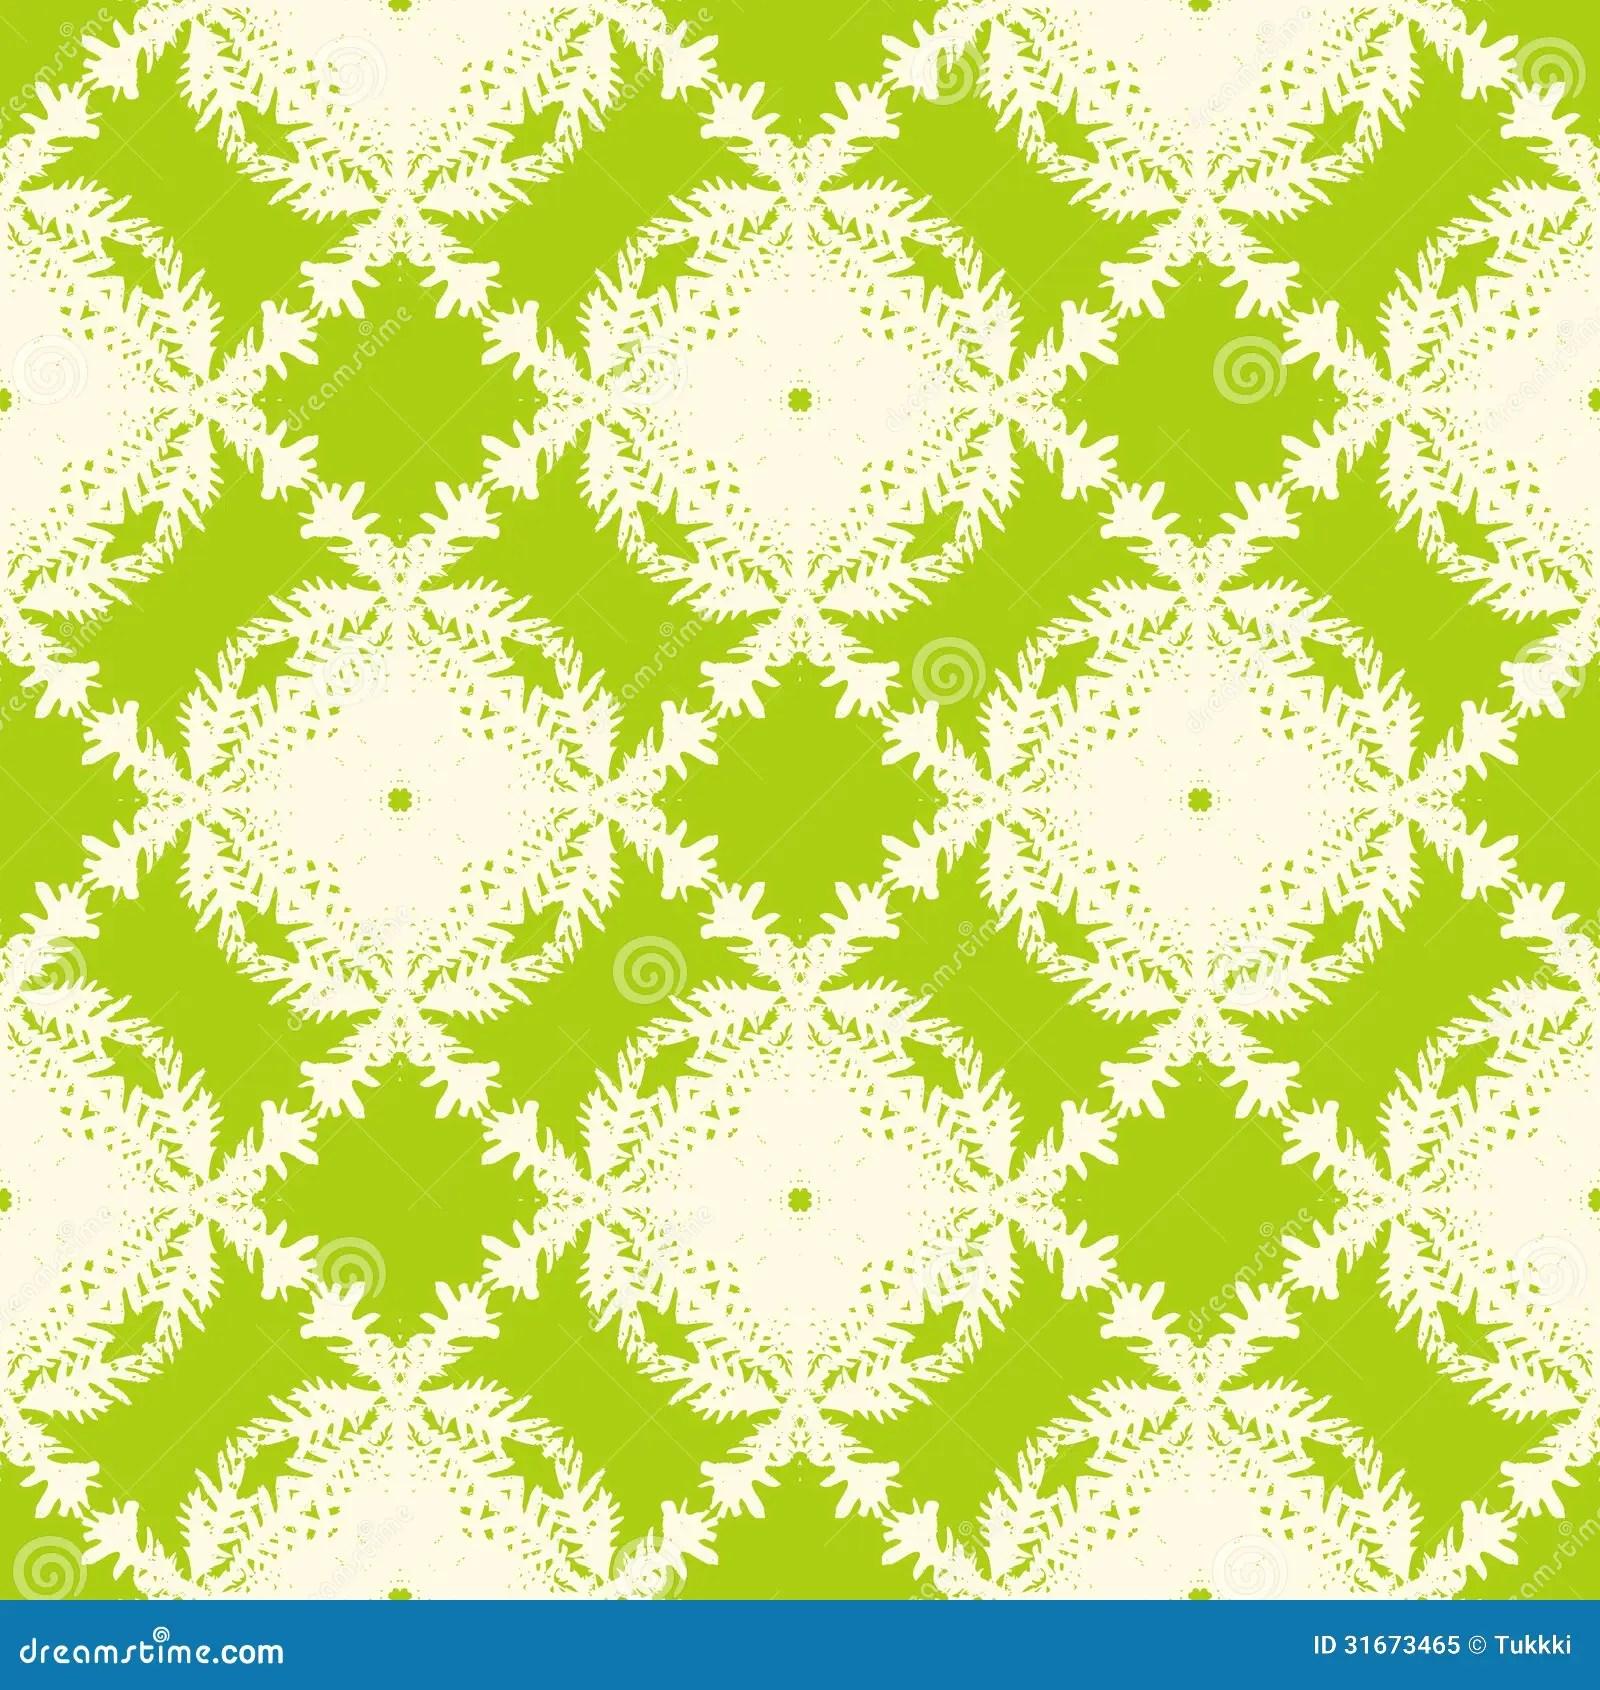 Fall Bohemian Fashion Wallpaper Simple Elegant Seamless Vector Pattern Stock Vector